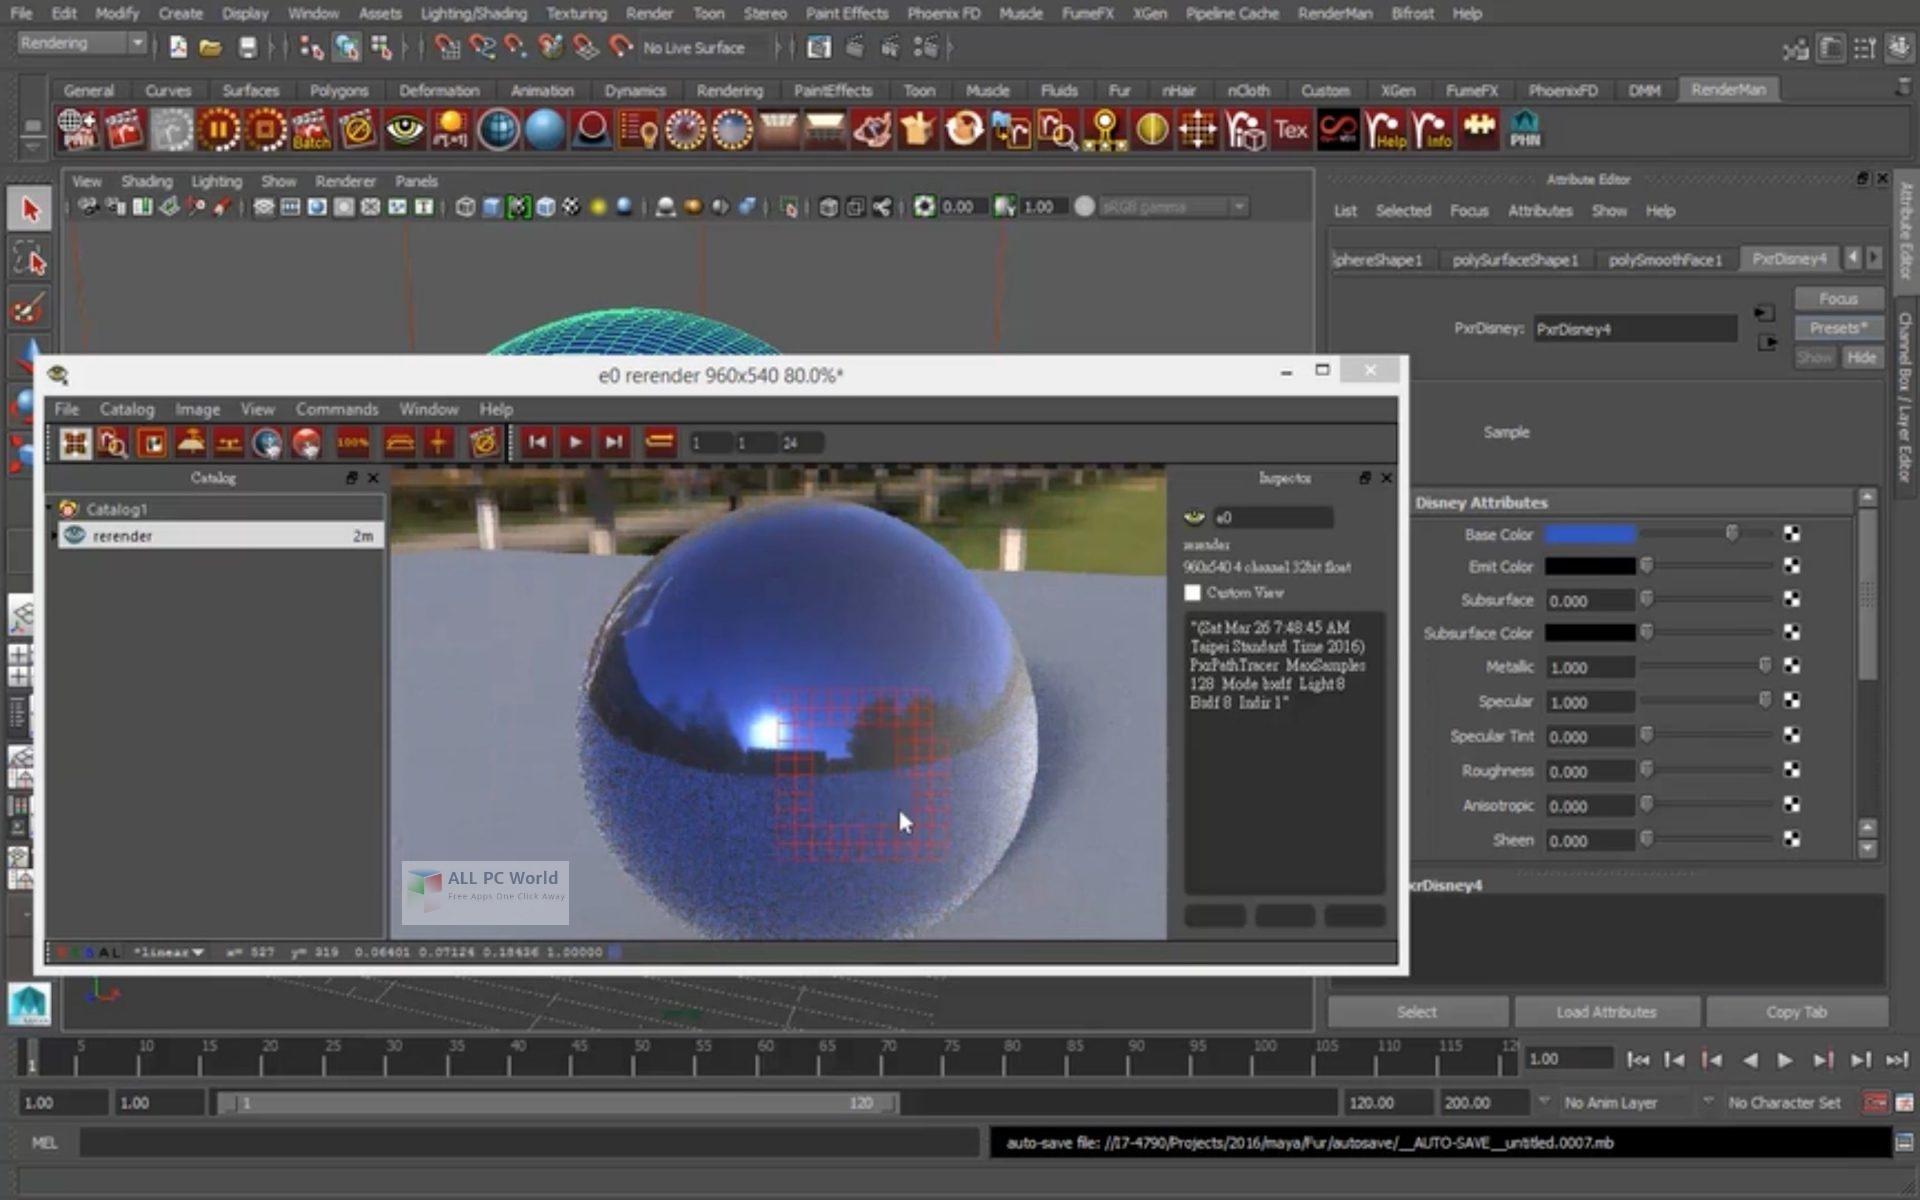 Pixar RenderMan v19.0 for Windows 10